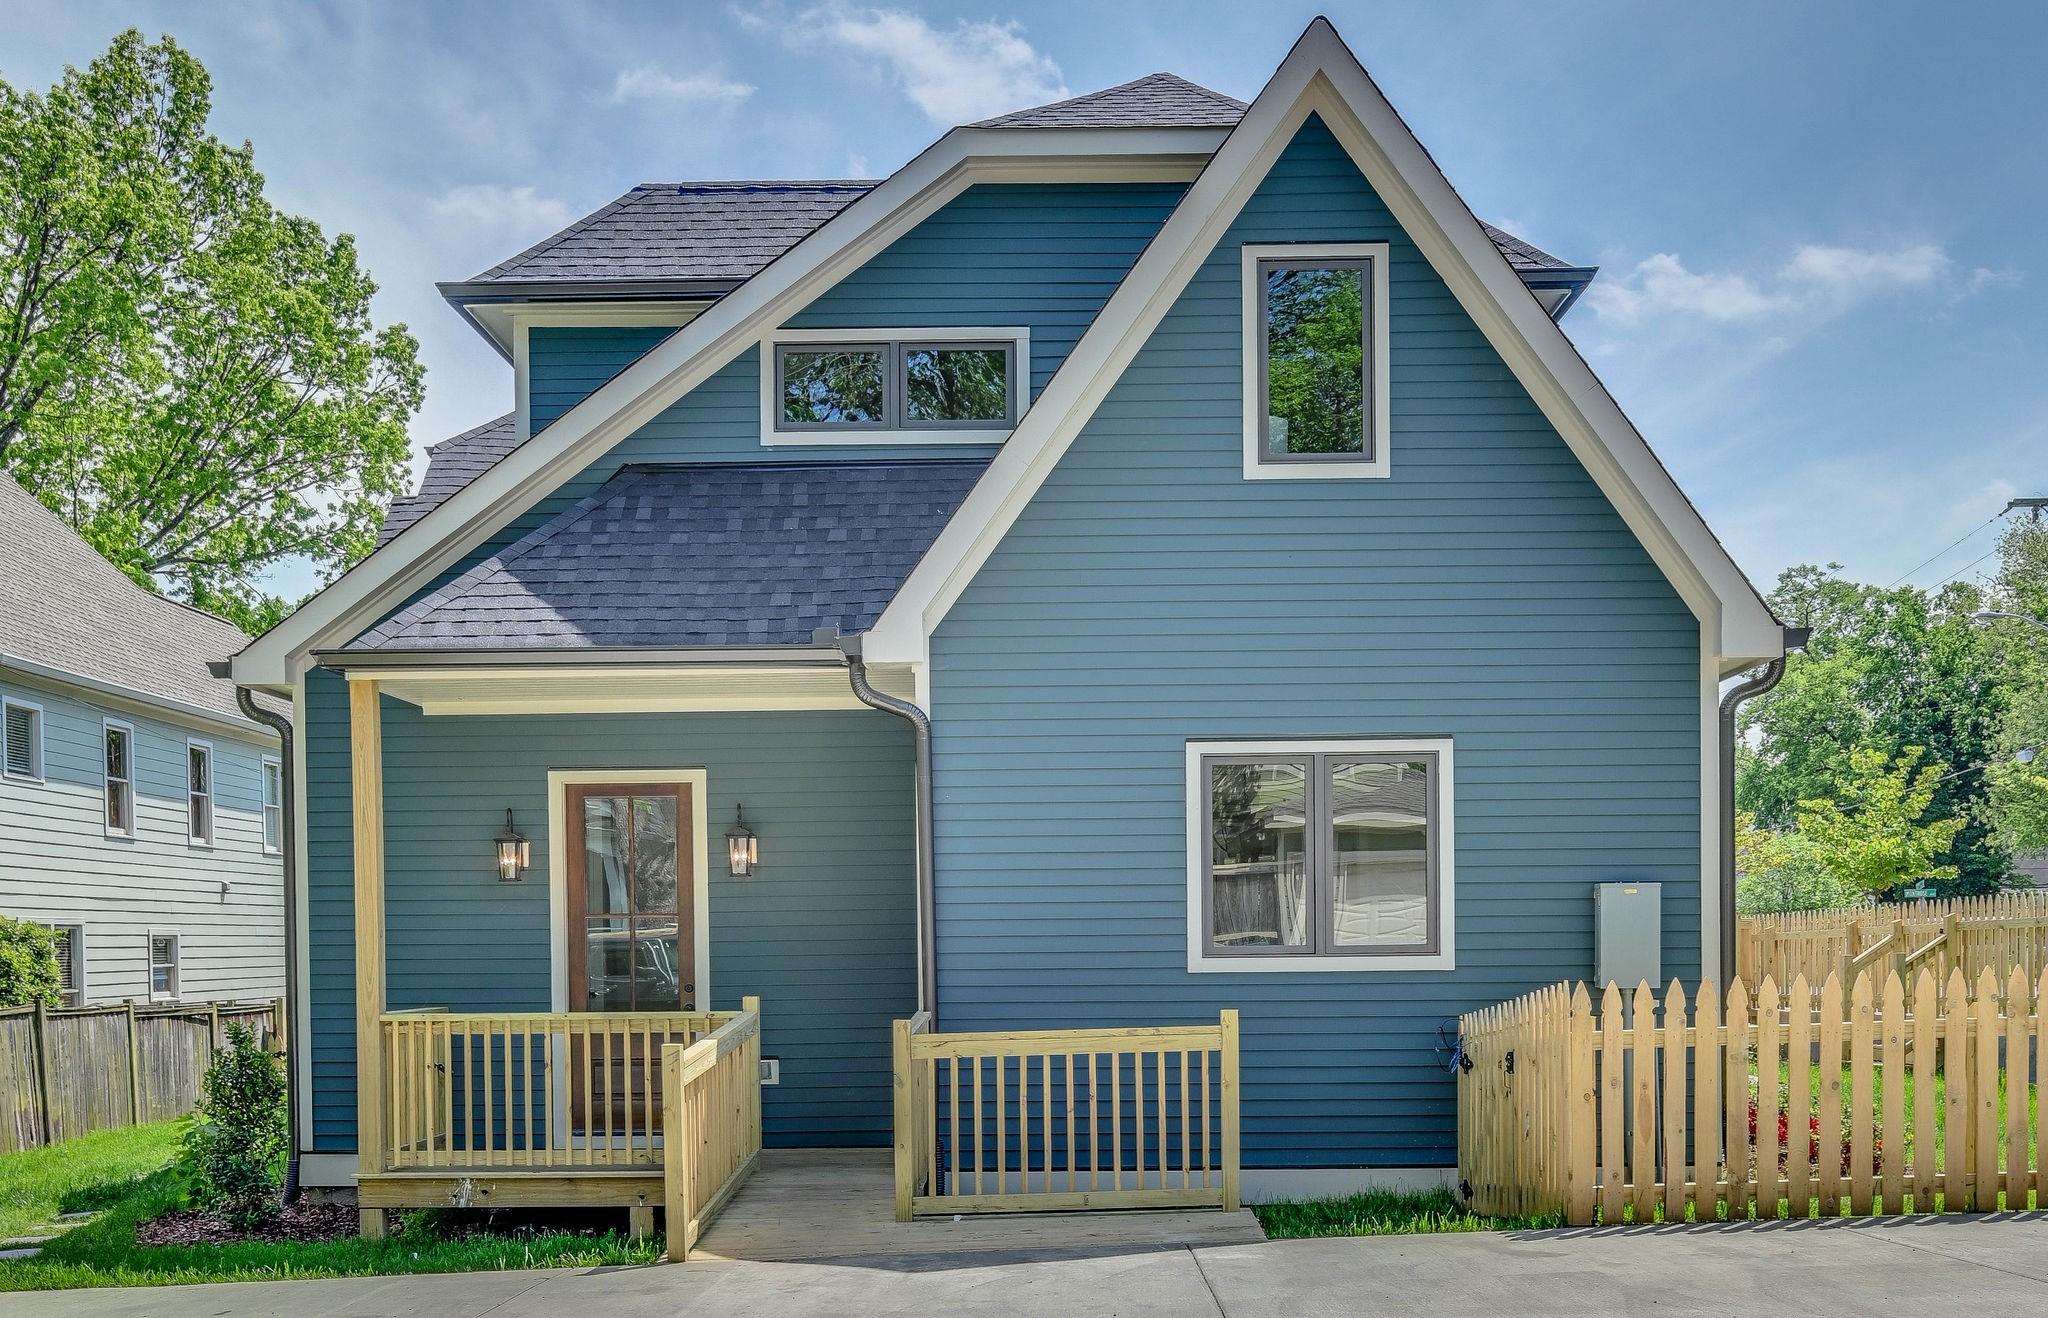 2508 10th Ave S Property Photo - Nashville, TN real estate listing